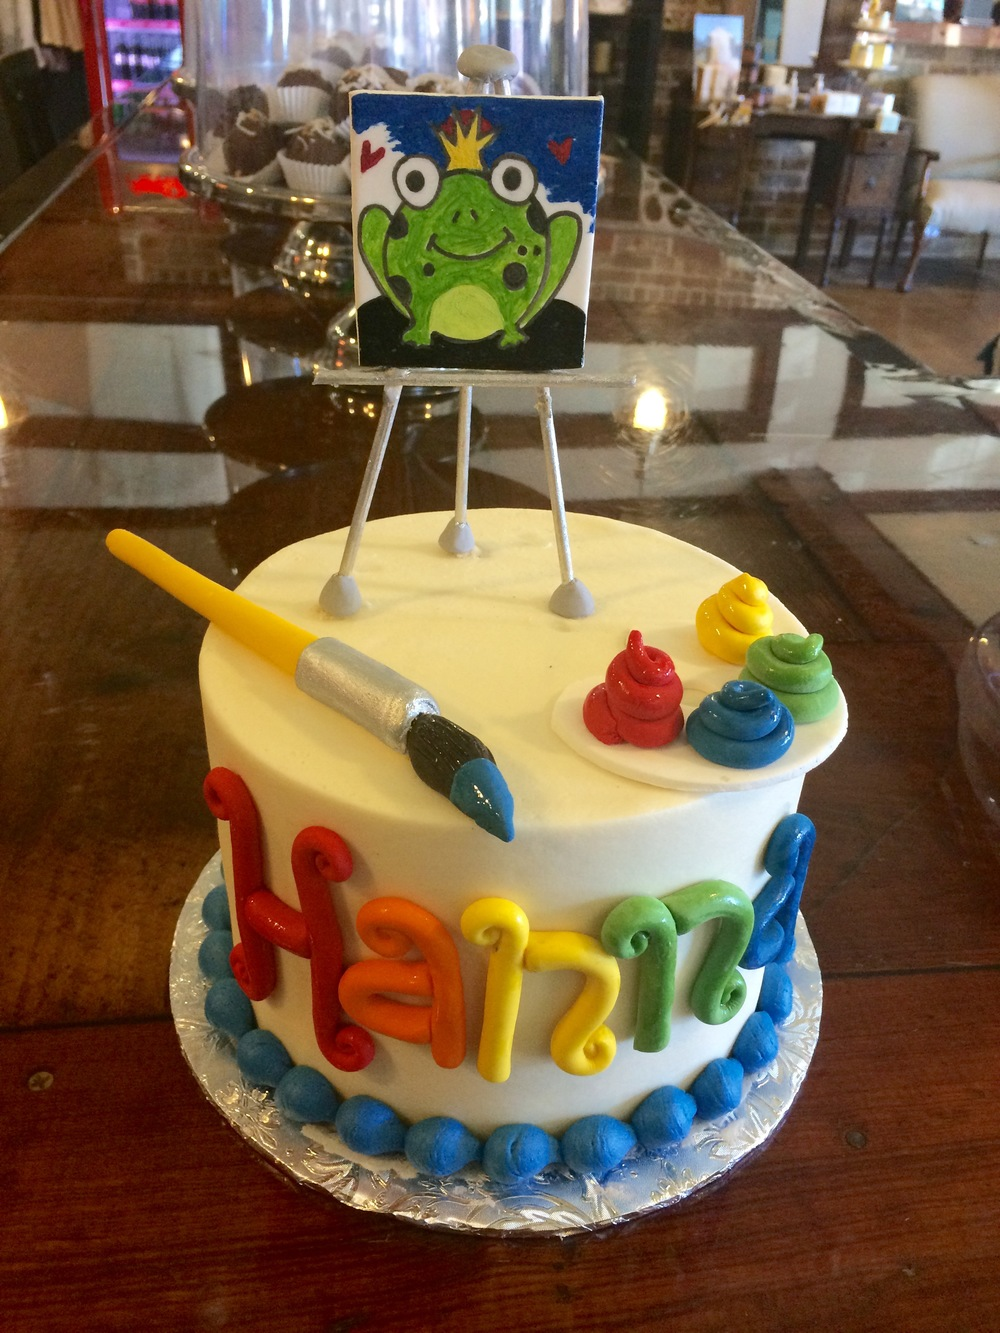 Artist_painting_birthday_cake_sugarbeesweets.jpg